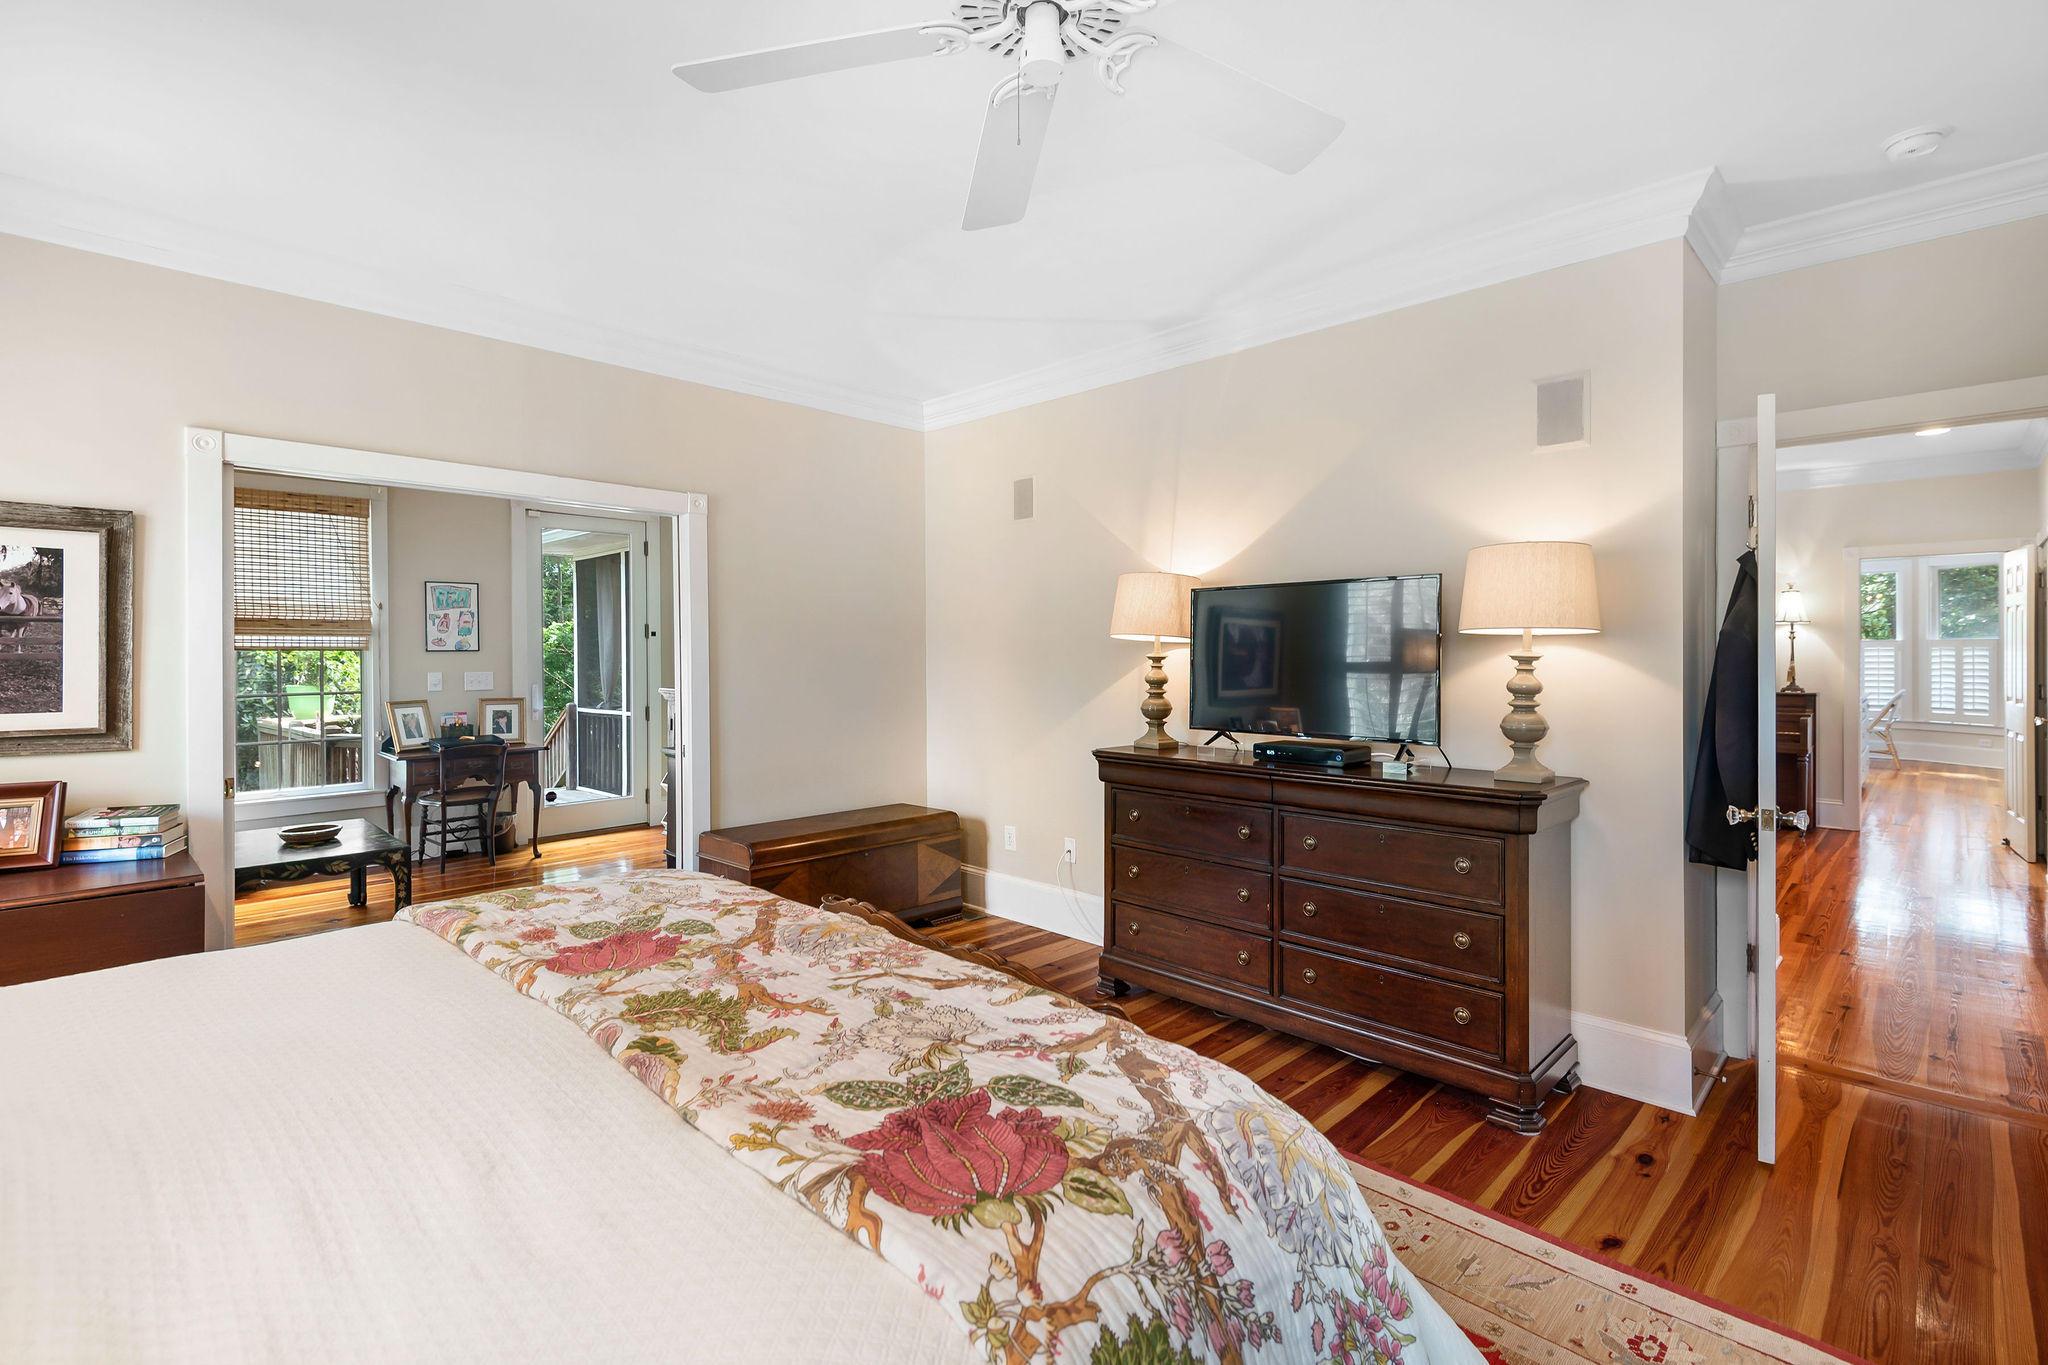 Country Club II Homes For Sale - 1482 Burningtree, Charleston, SC - 41